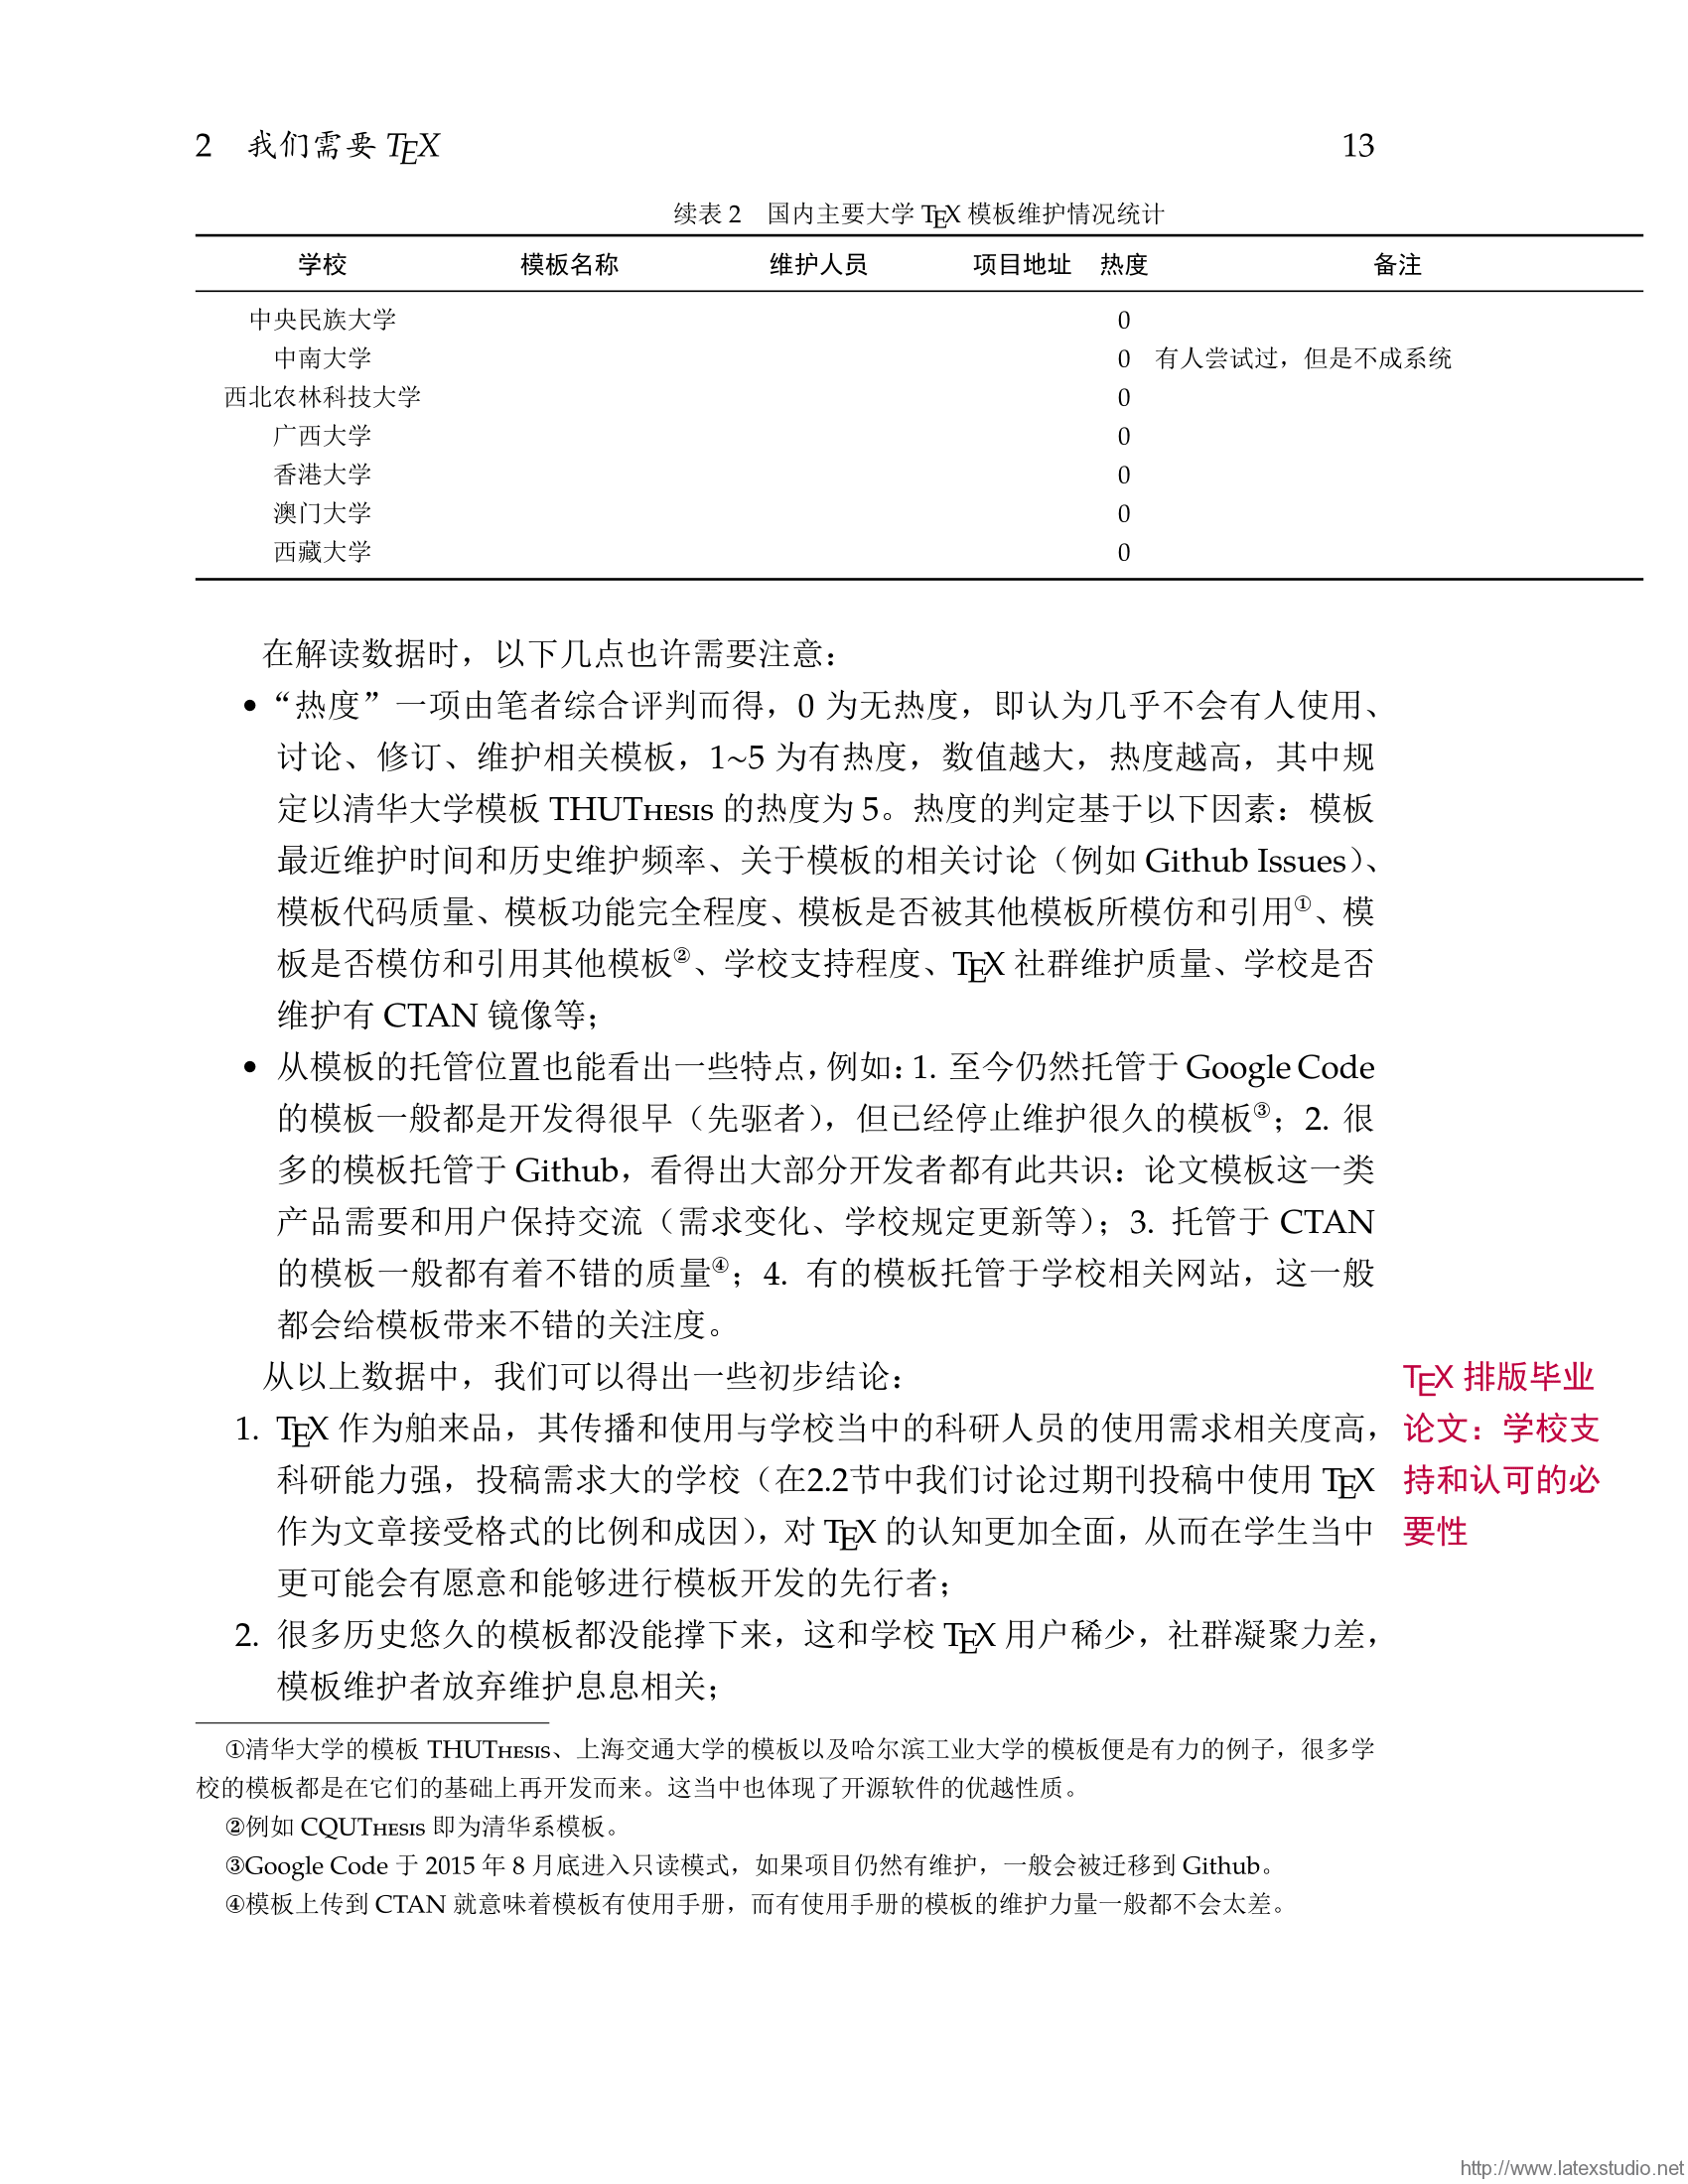 texproposal-15